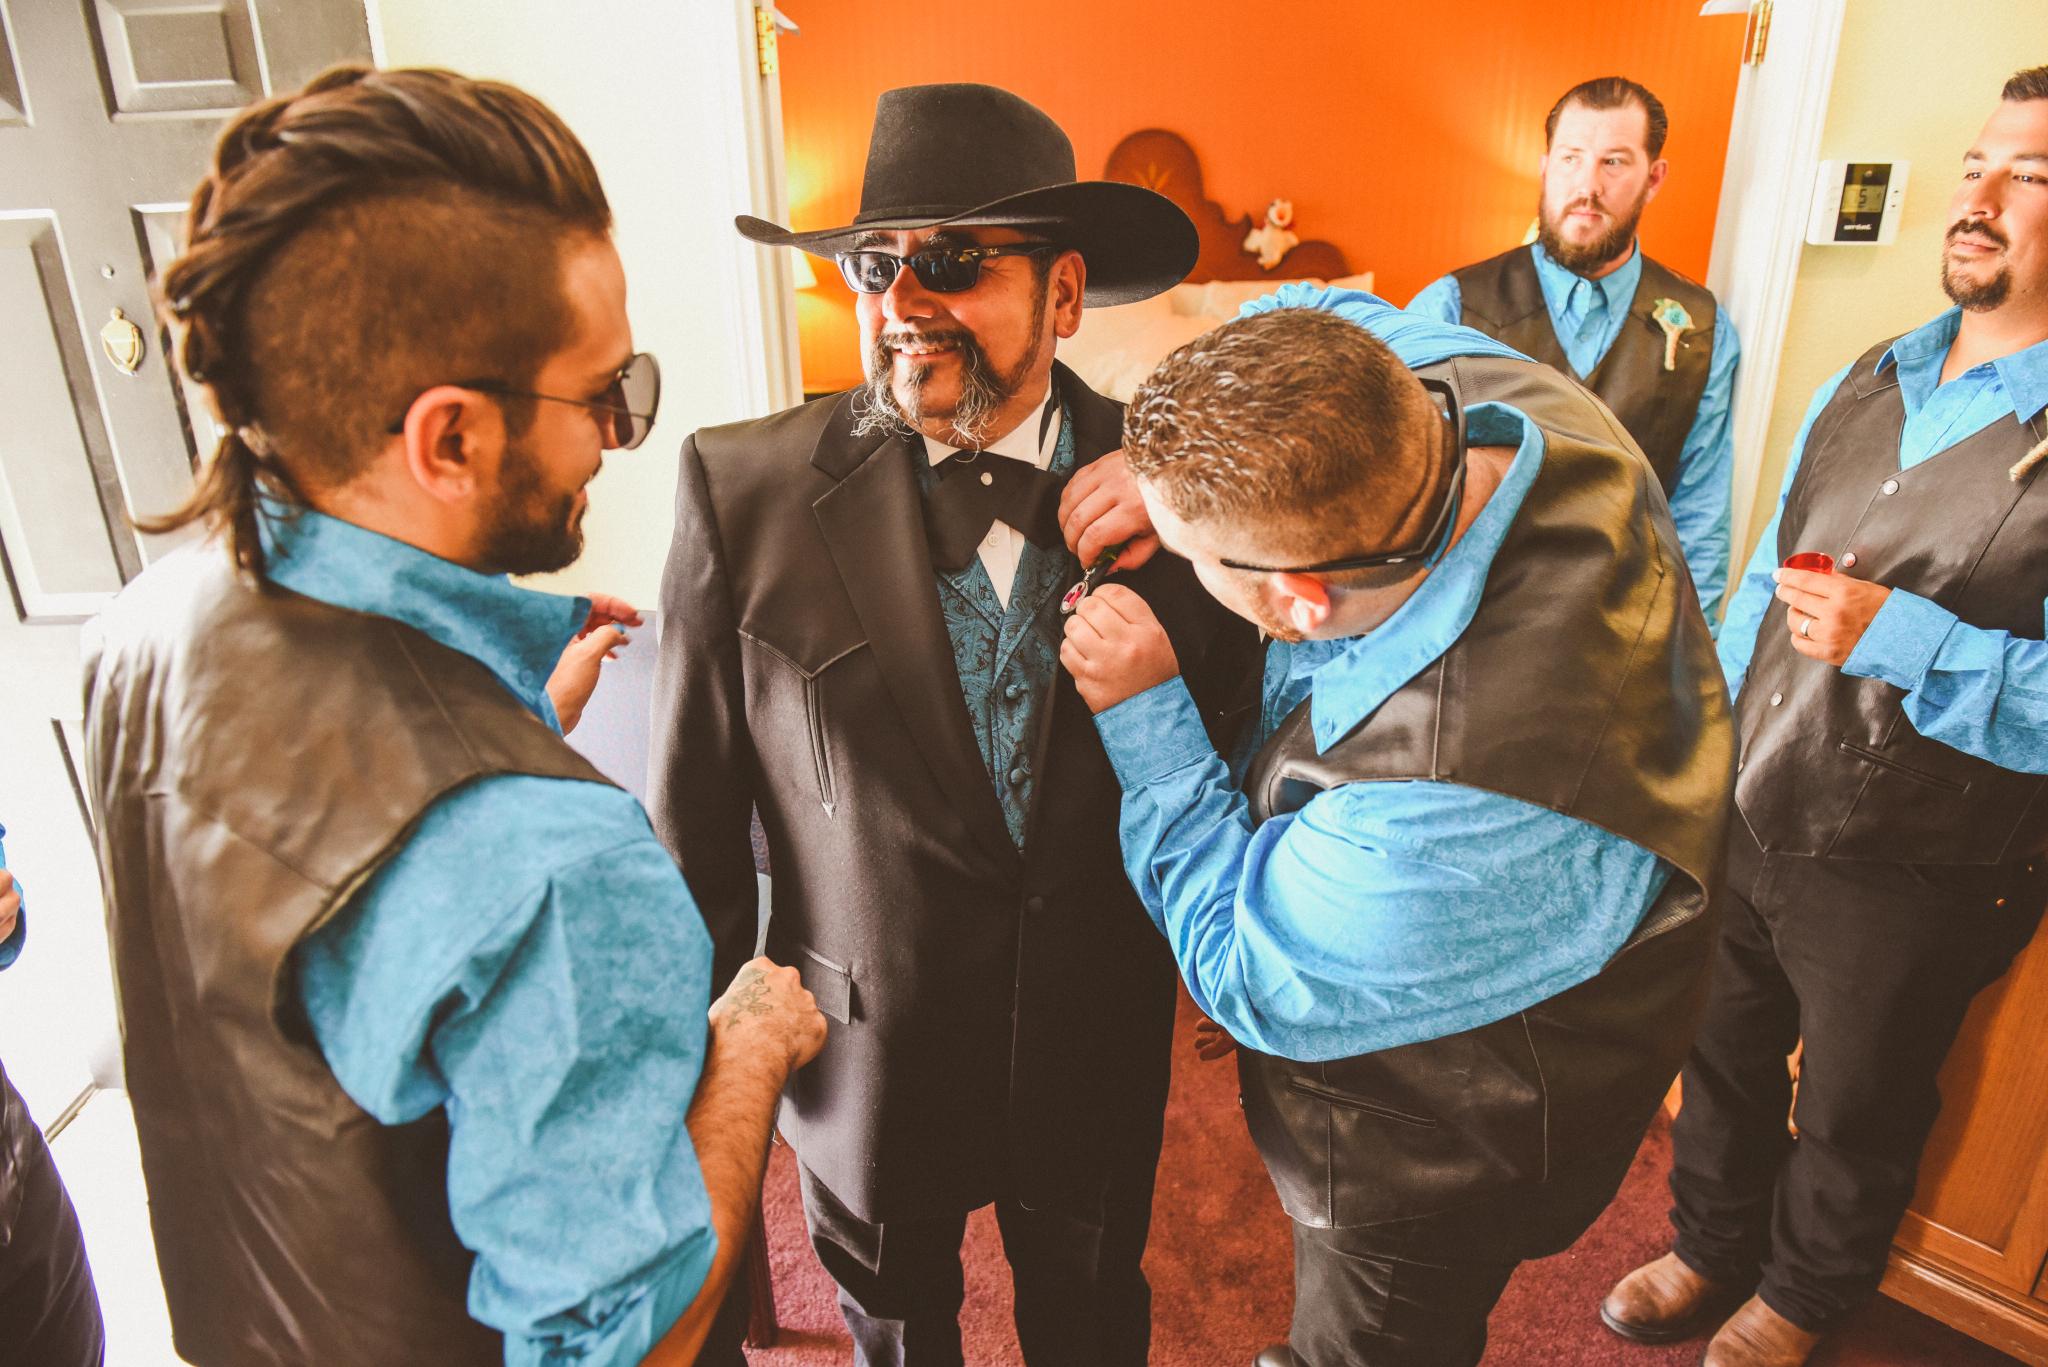 san diego wedding   photographer   men in turquoise helping man in cowboy hat dress